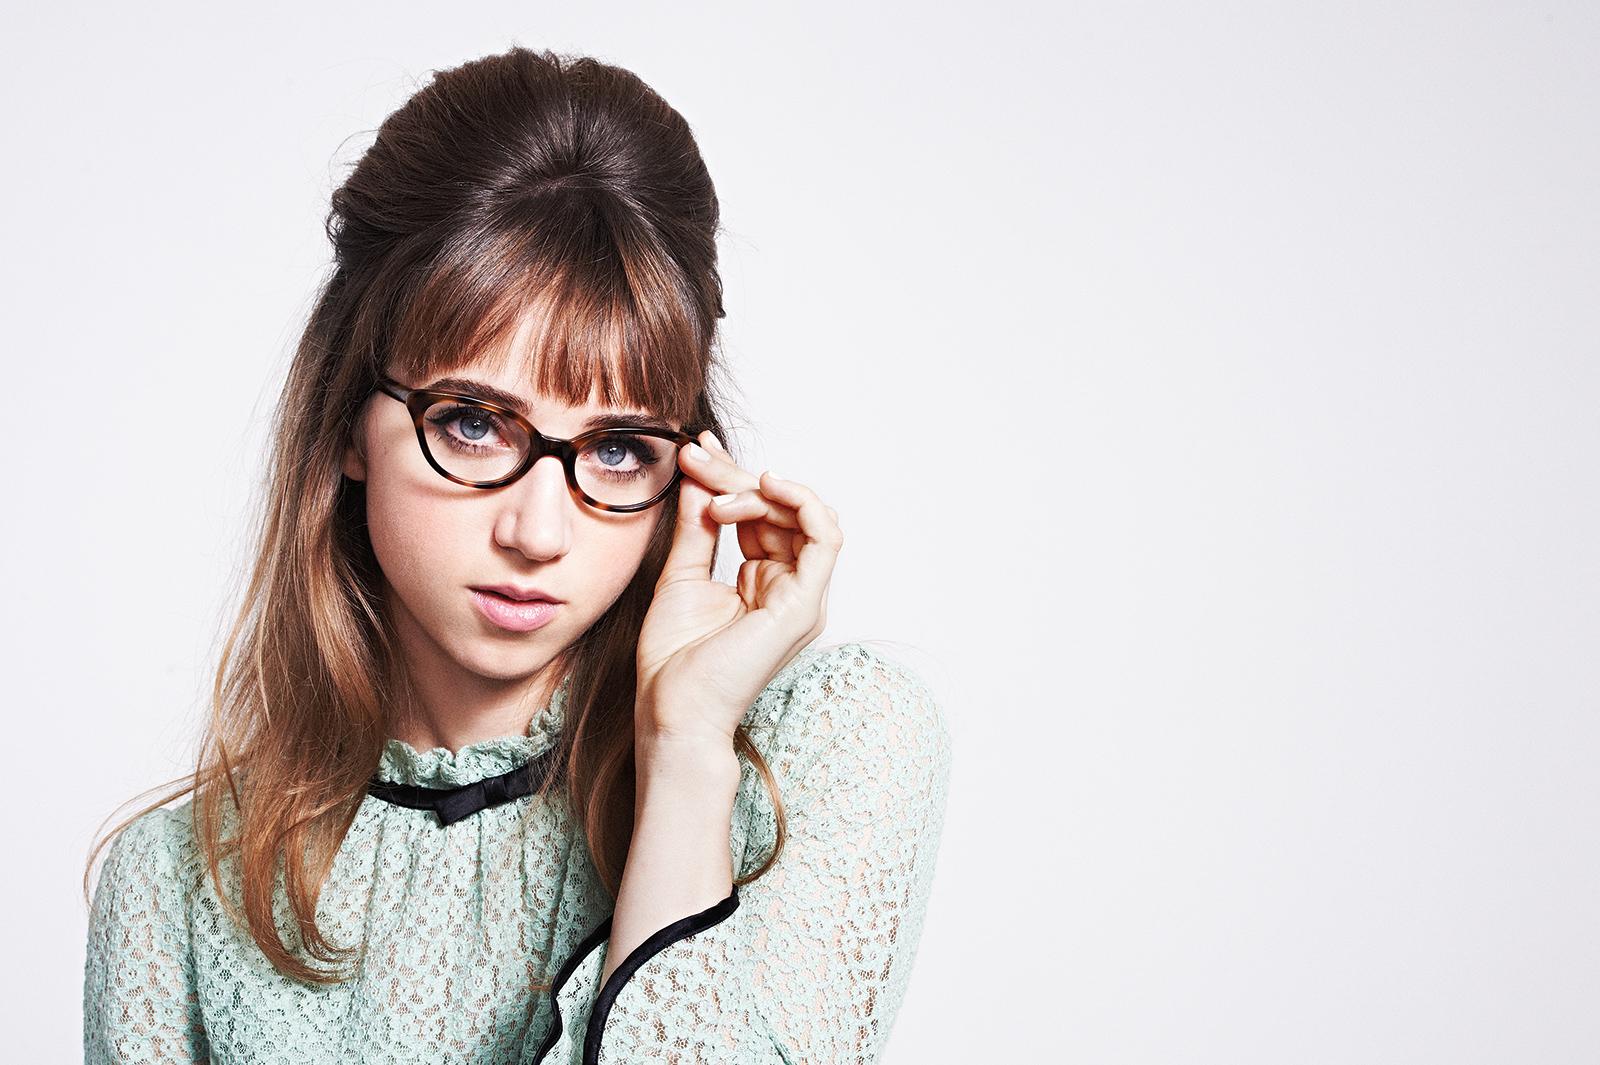 Zoe Kazen for Warby Parker-7